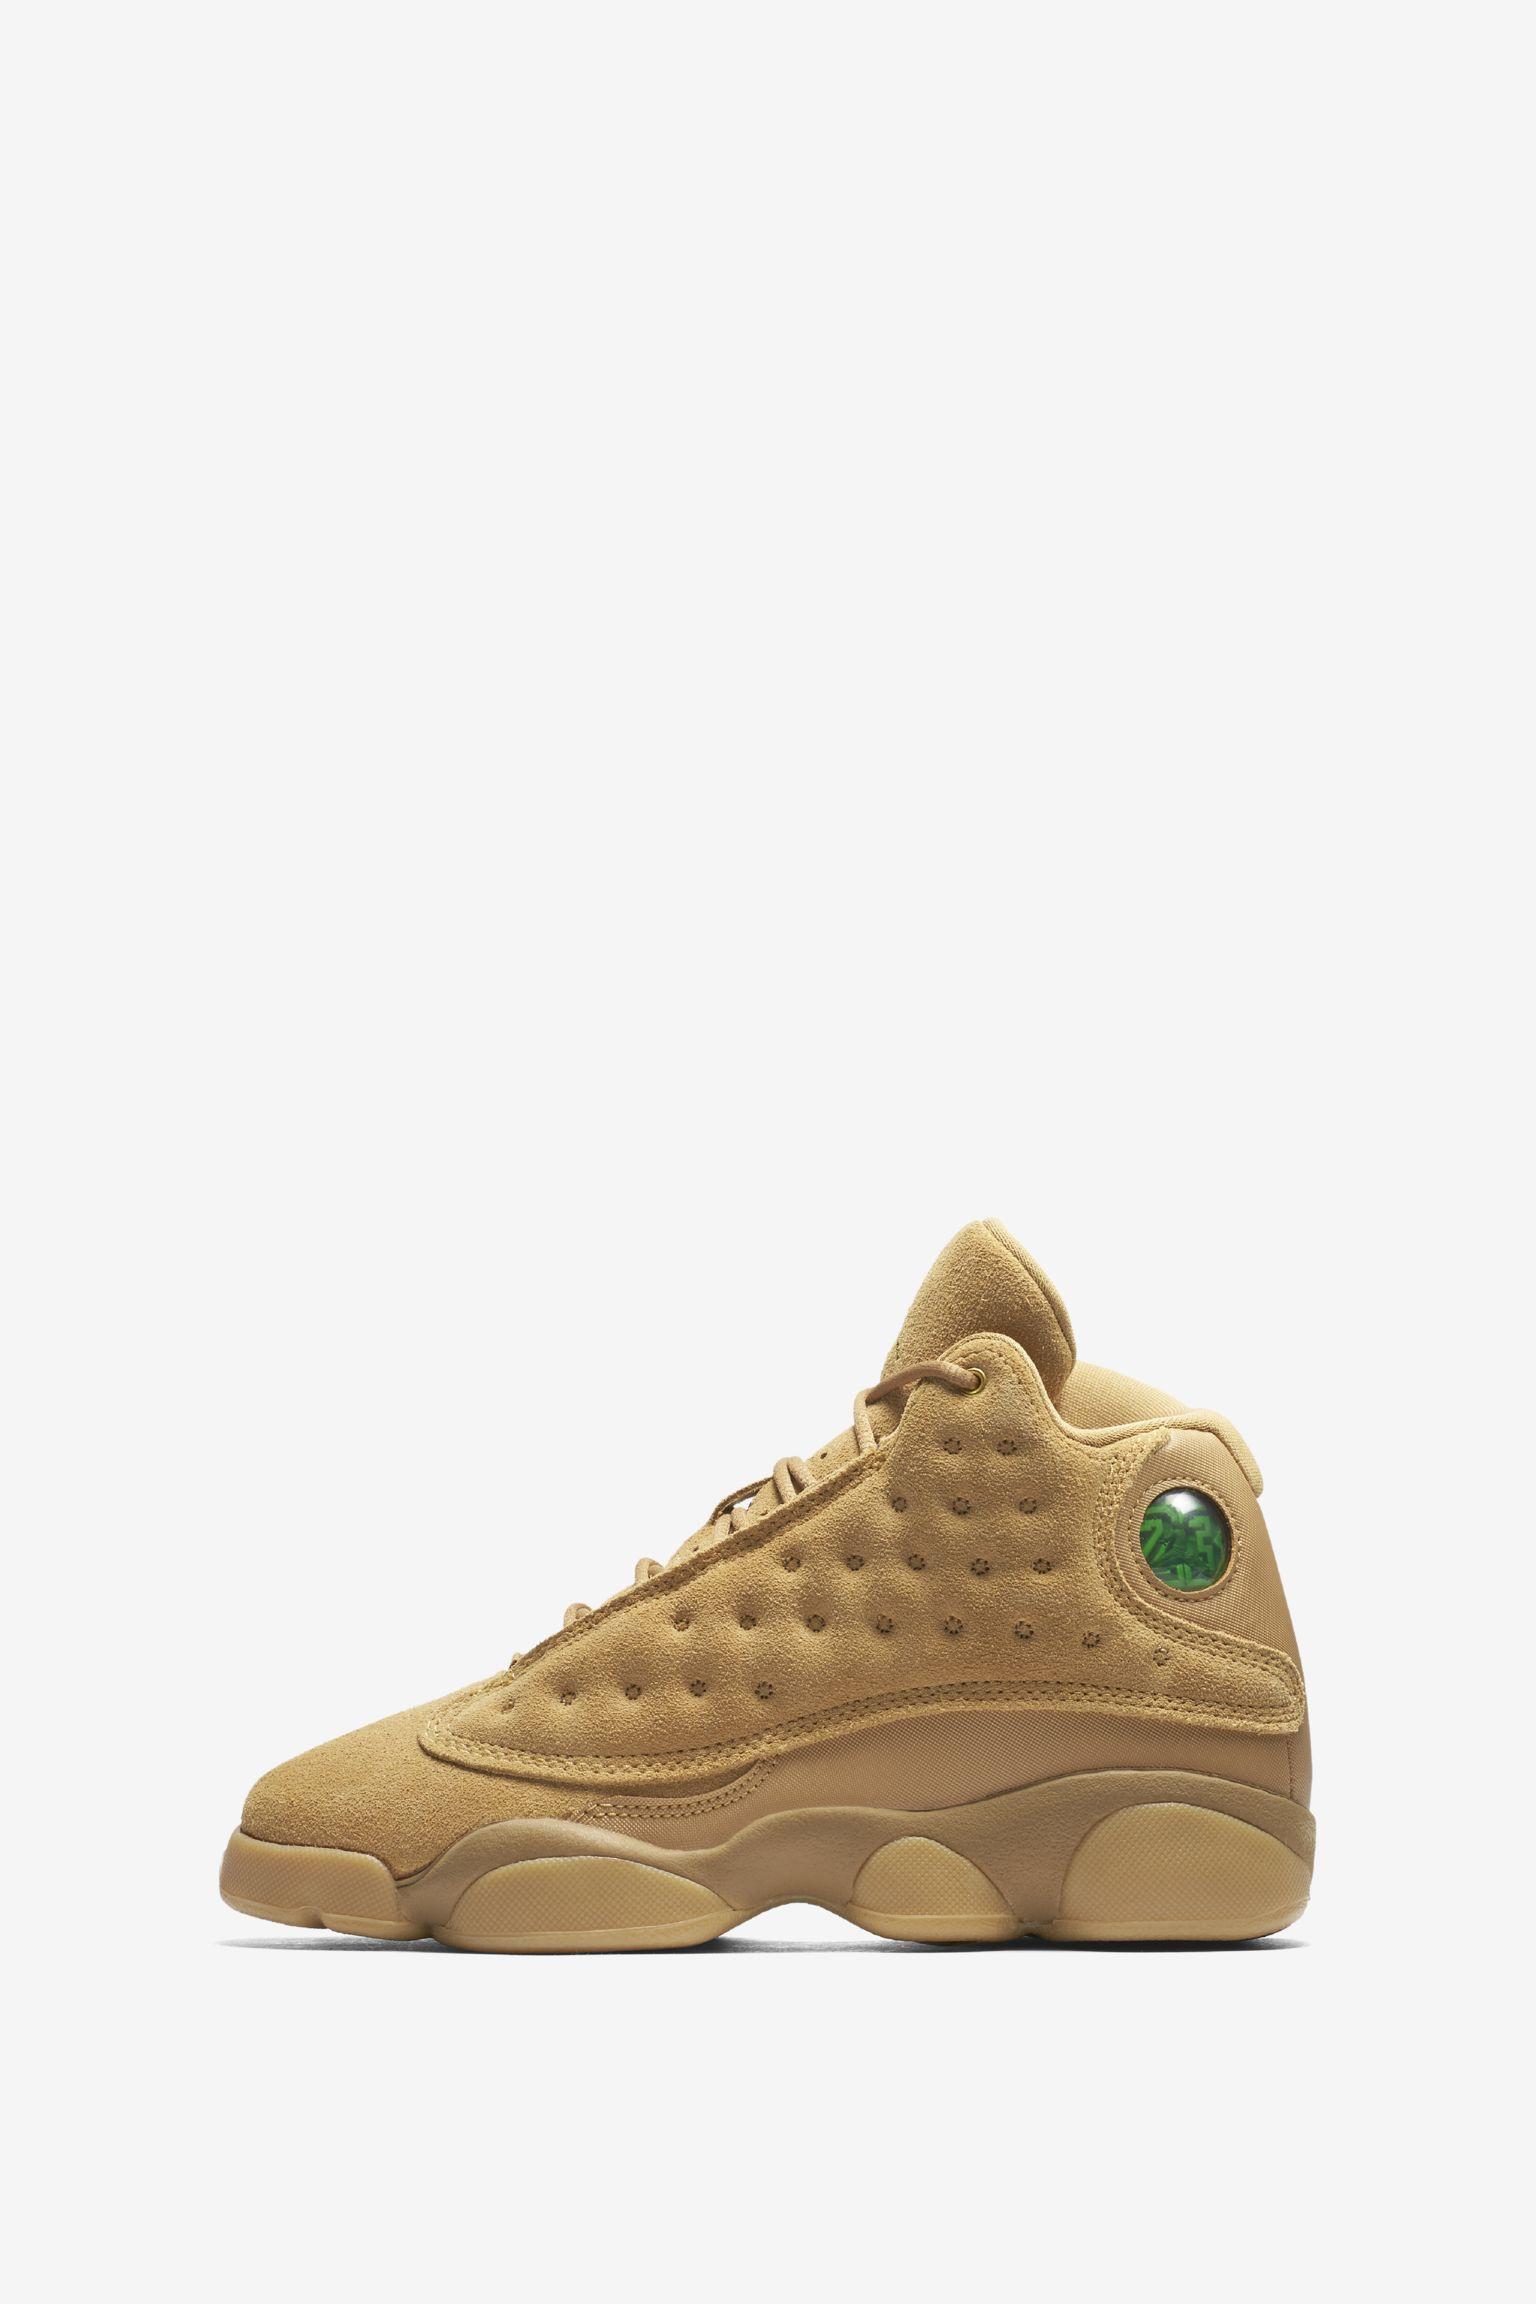 Air Jordan 13 'Wheat' Release Date